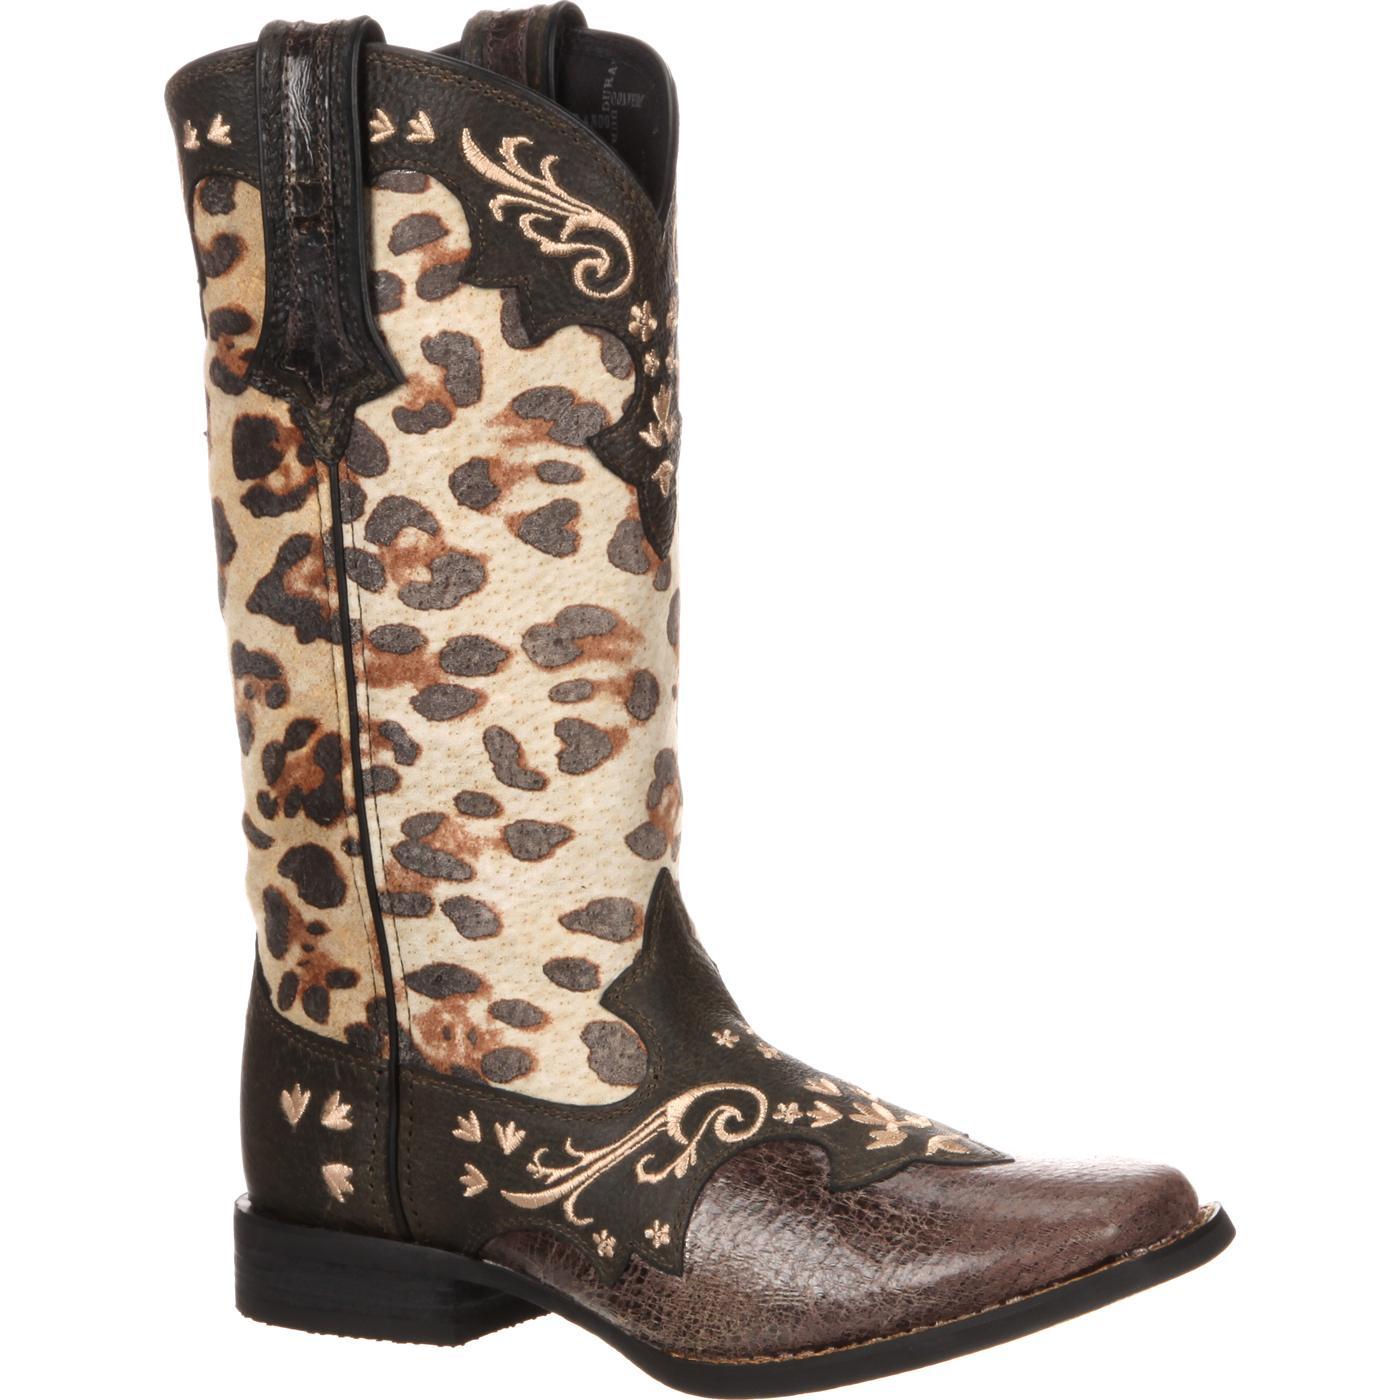 450dc39e79b2 Crush by Durango Women s Leopard Western Boot